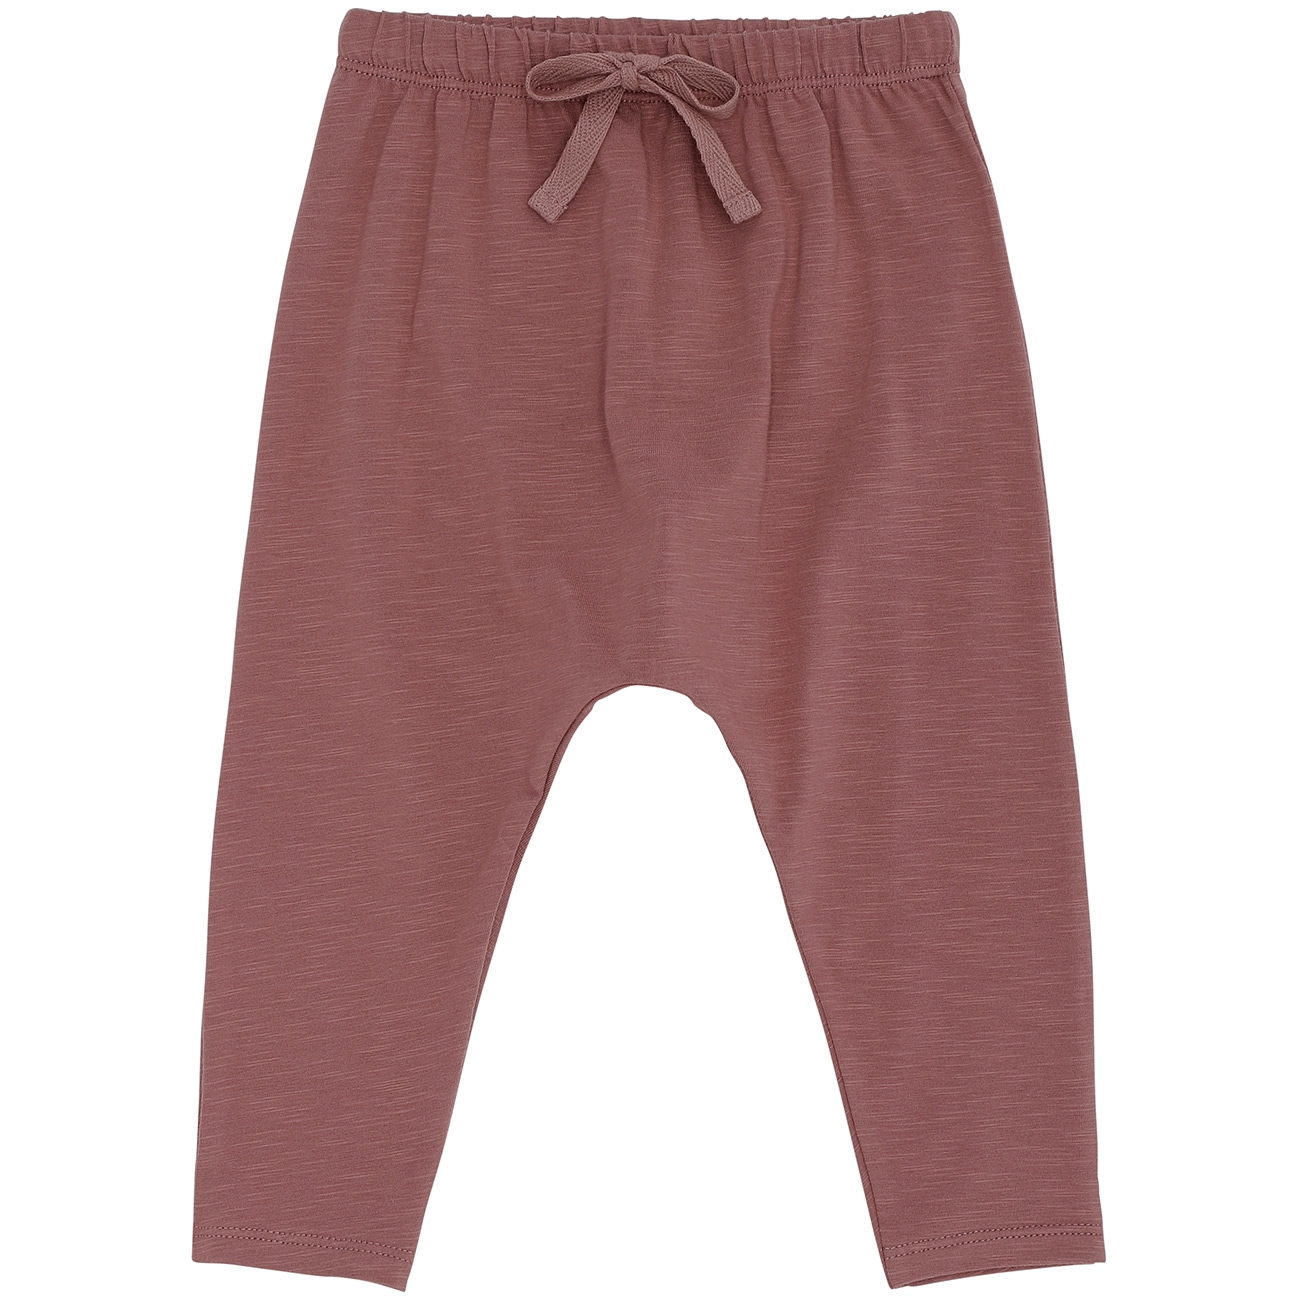 Soft Gallery Burlywood Hailey Pants